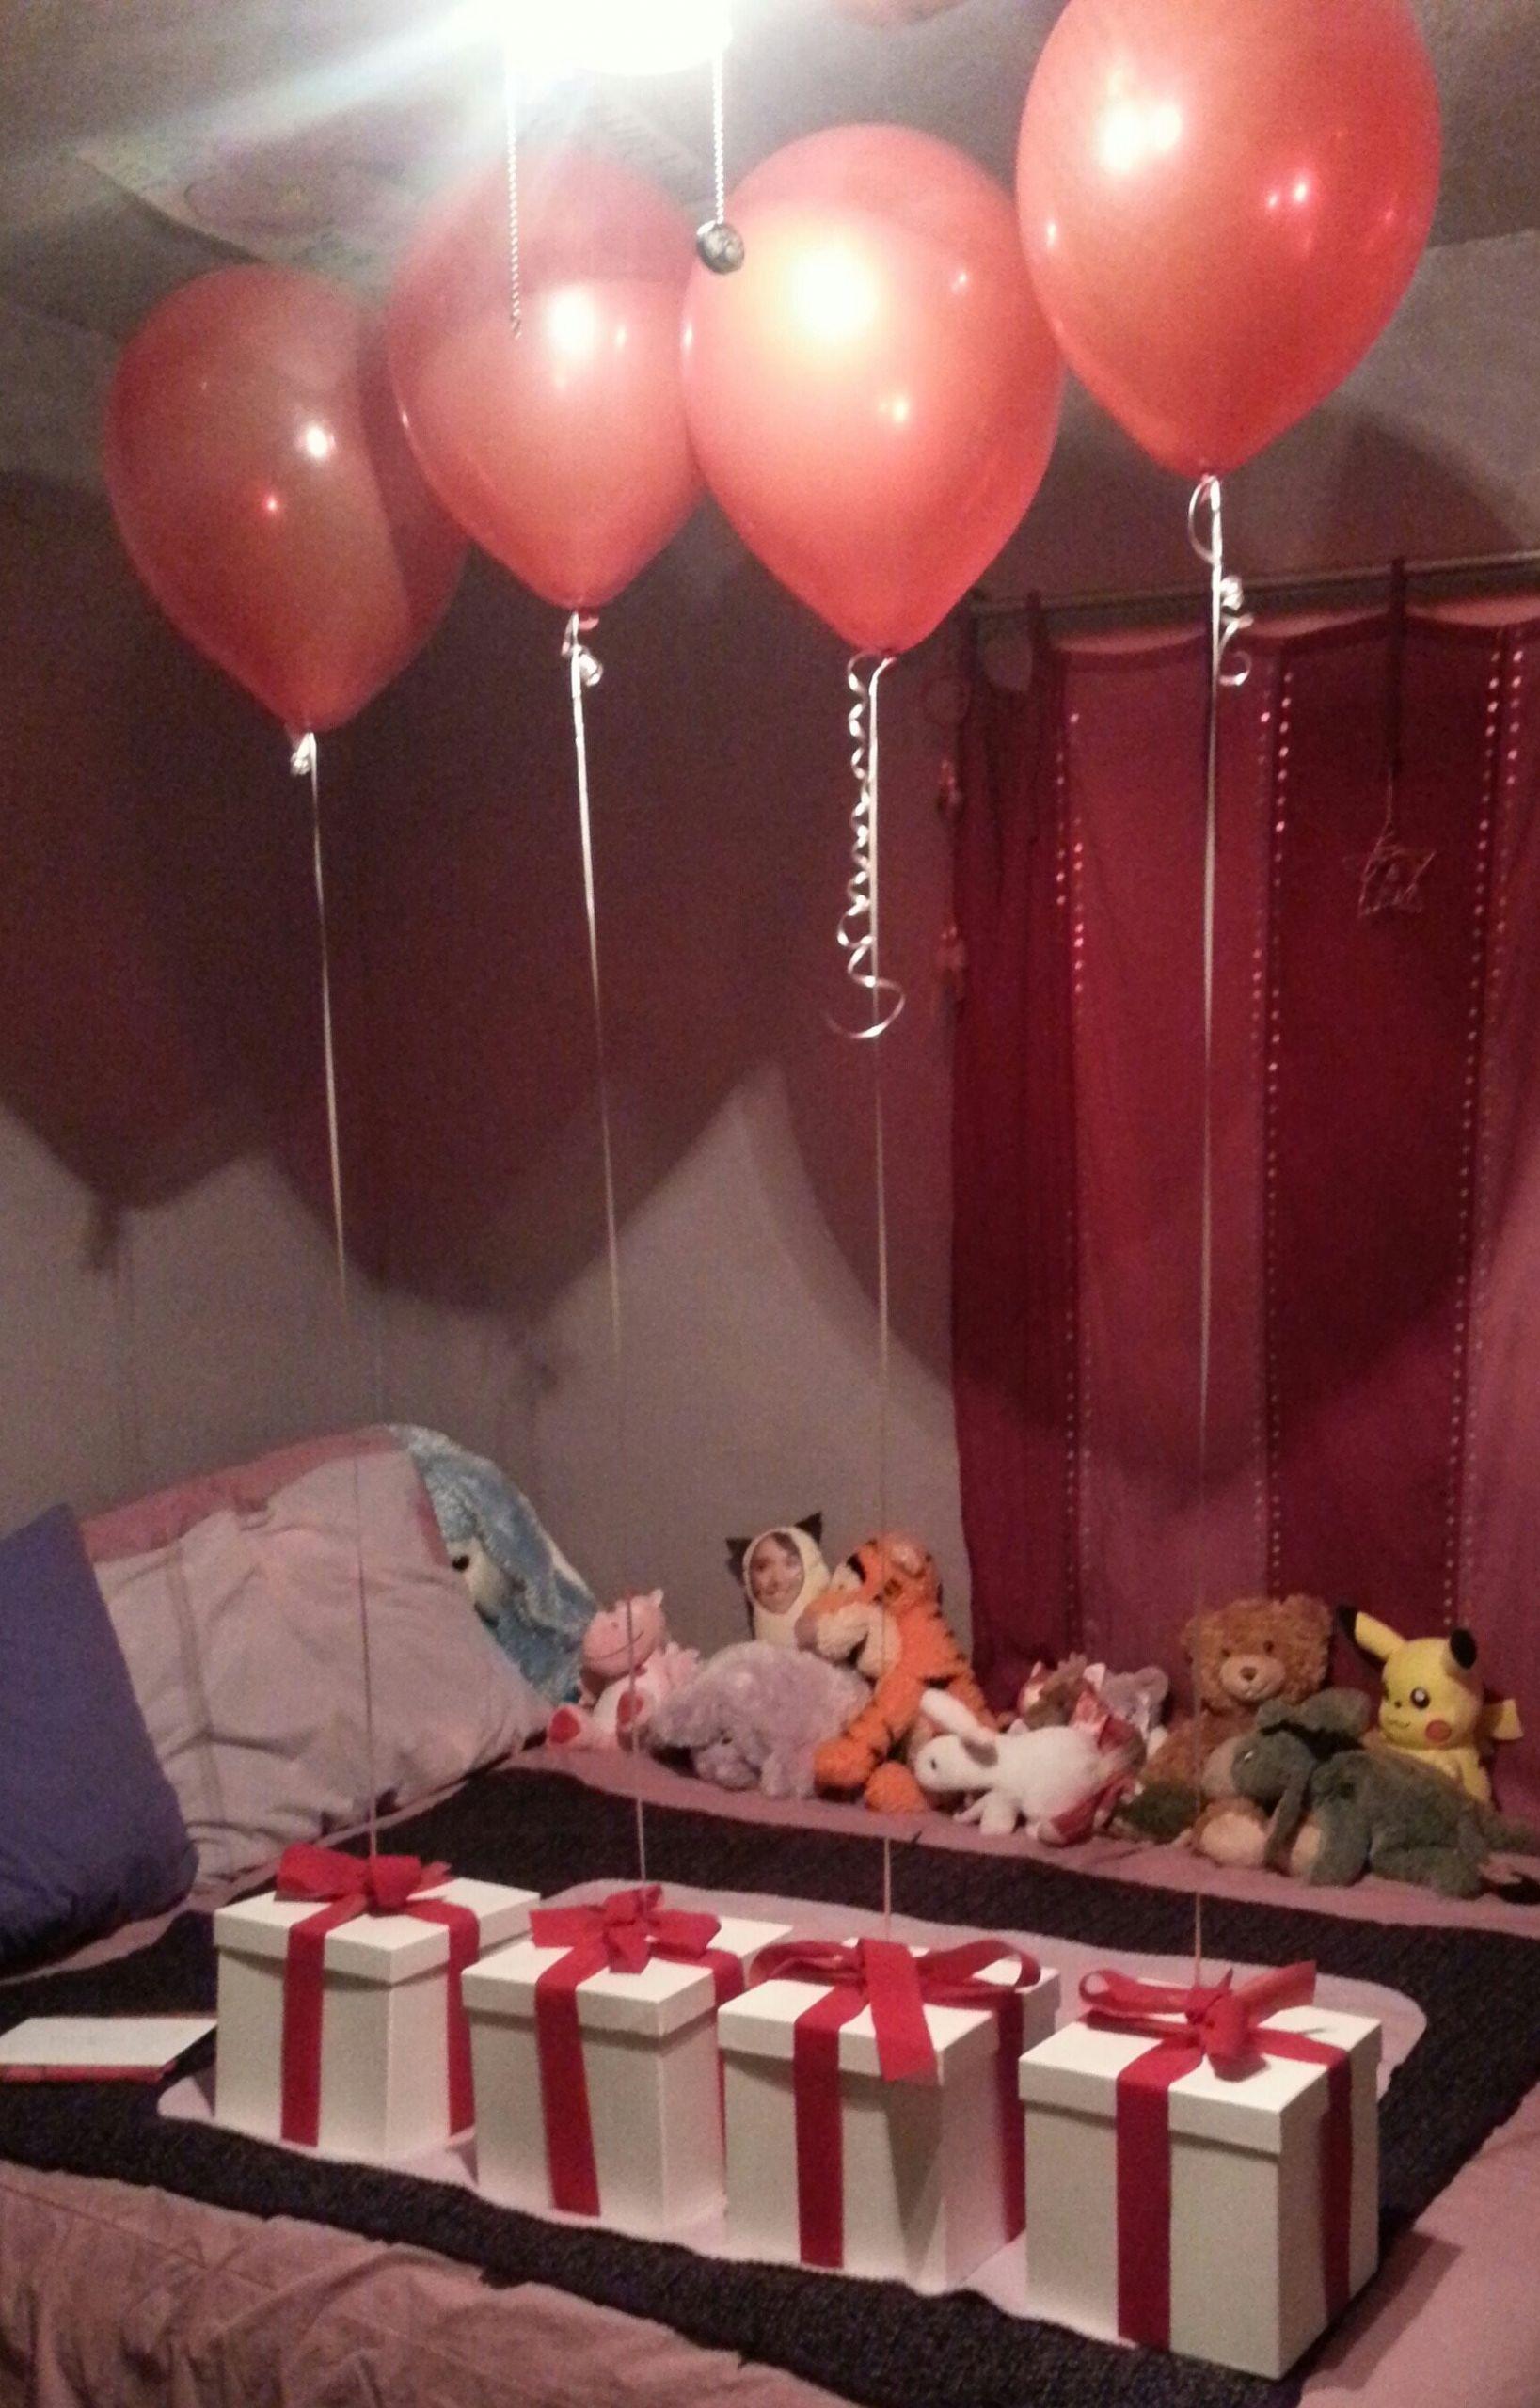 Creative Gift Ideas For Boyfriend  10 Lovable Romantic Birthday Gift Ideas Boyfriend 2020